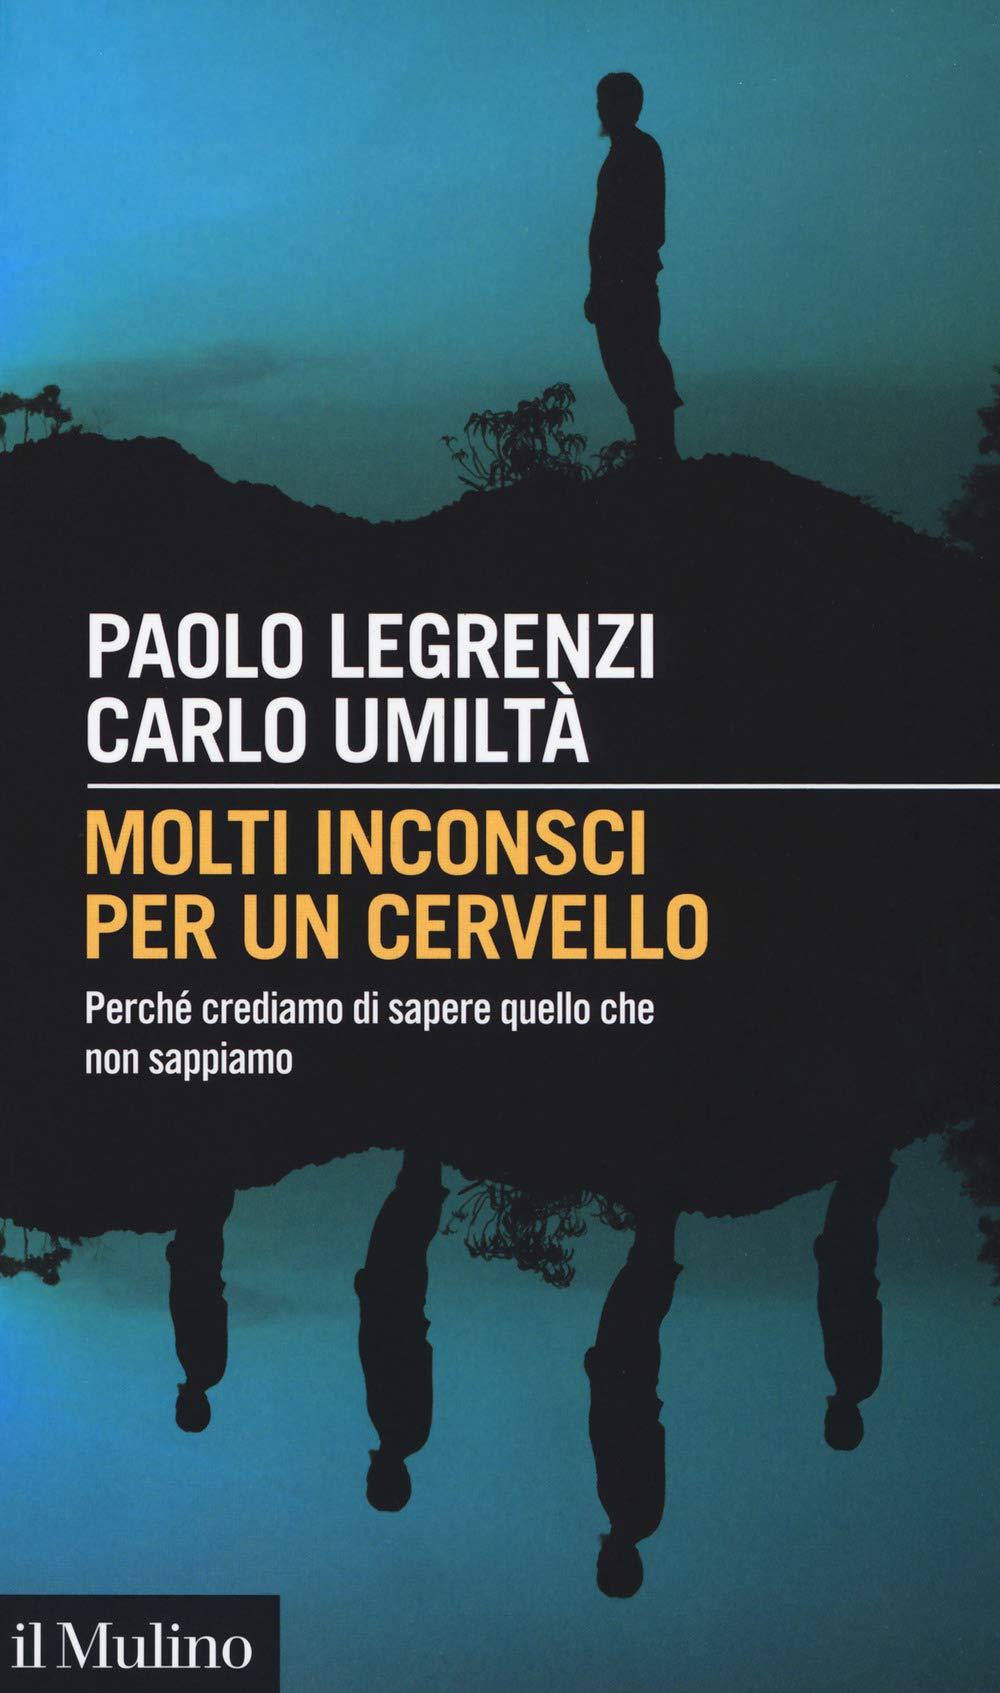 Paolo Legrenzi